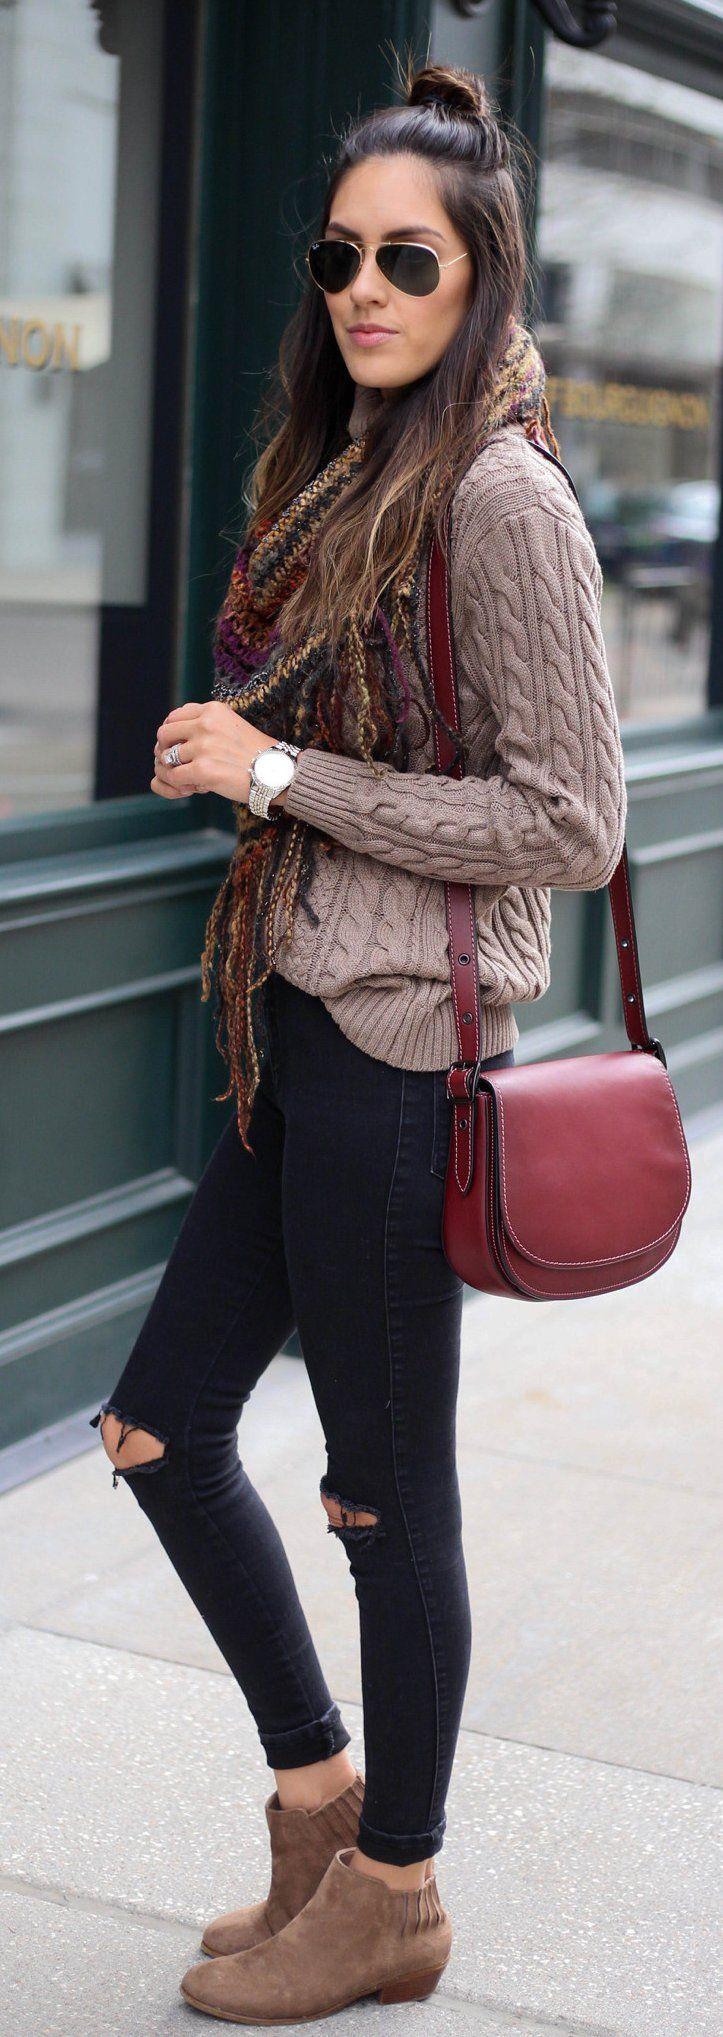 Brown Knit / Red Leather Shoulder Bag / Brown Suede Booties / Black Destroyed Skinny Jeans / Printed Scarf